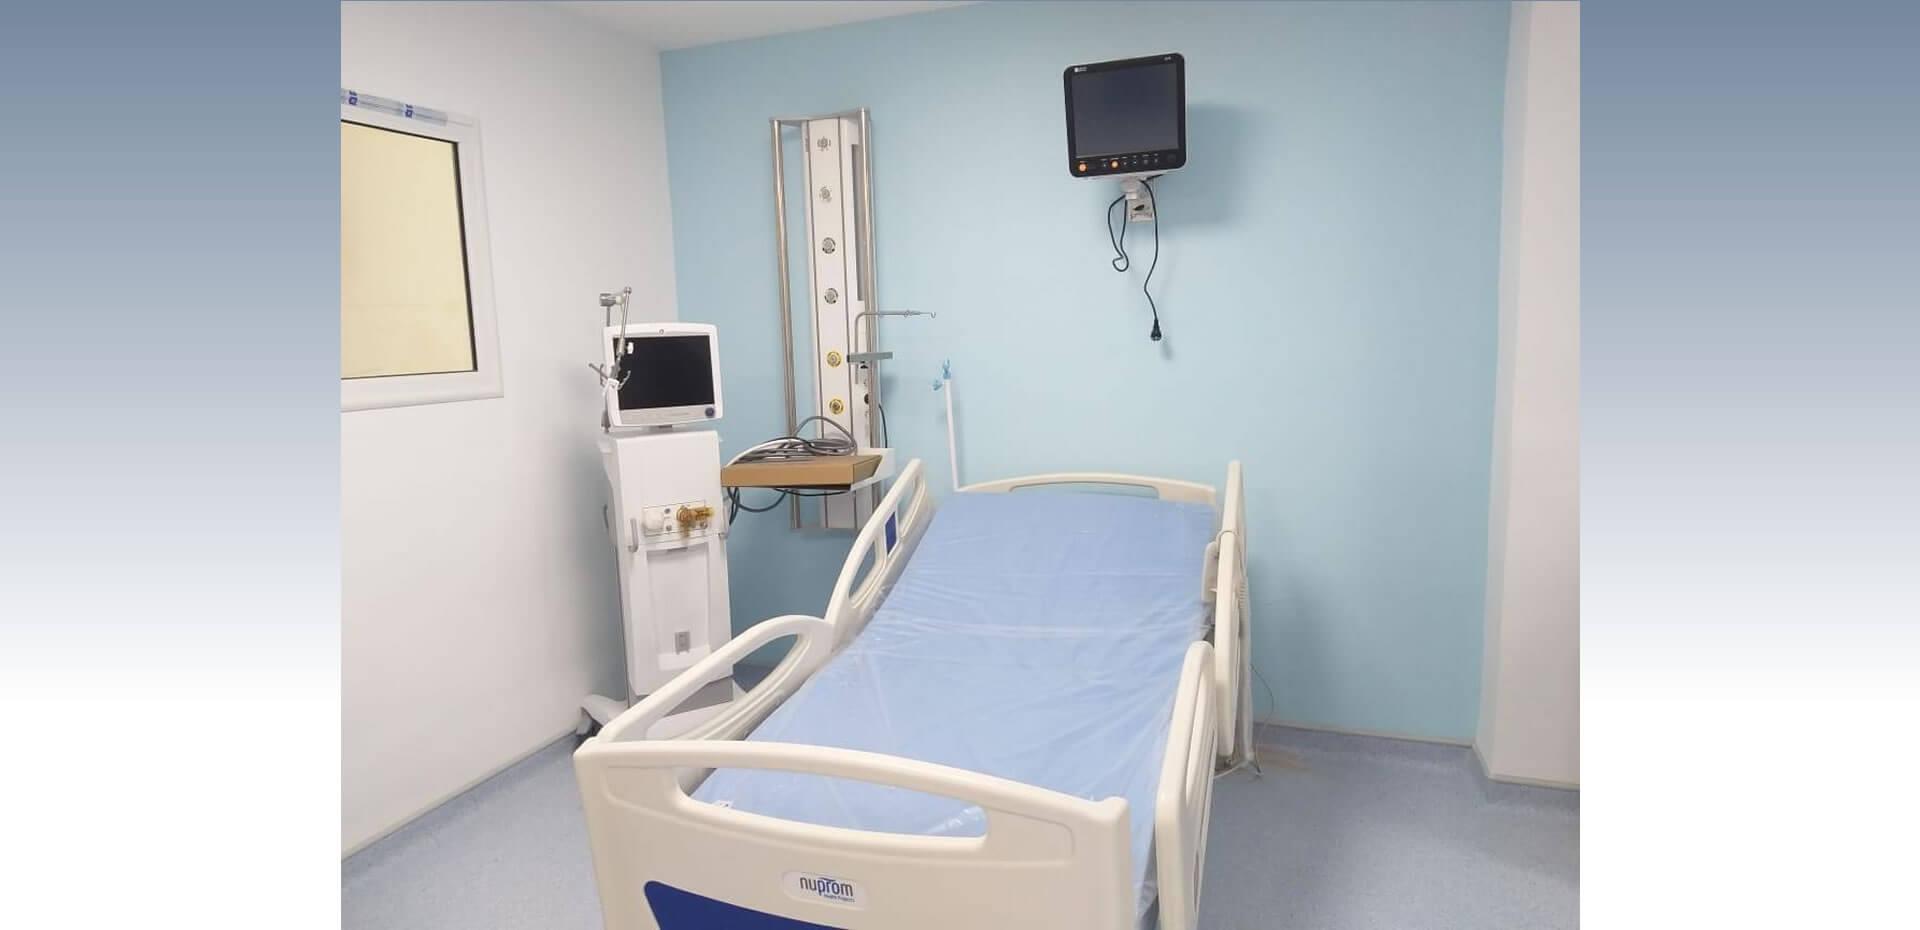 Nuprom-Tunisia-Hospital-Bed-1